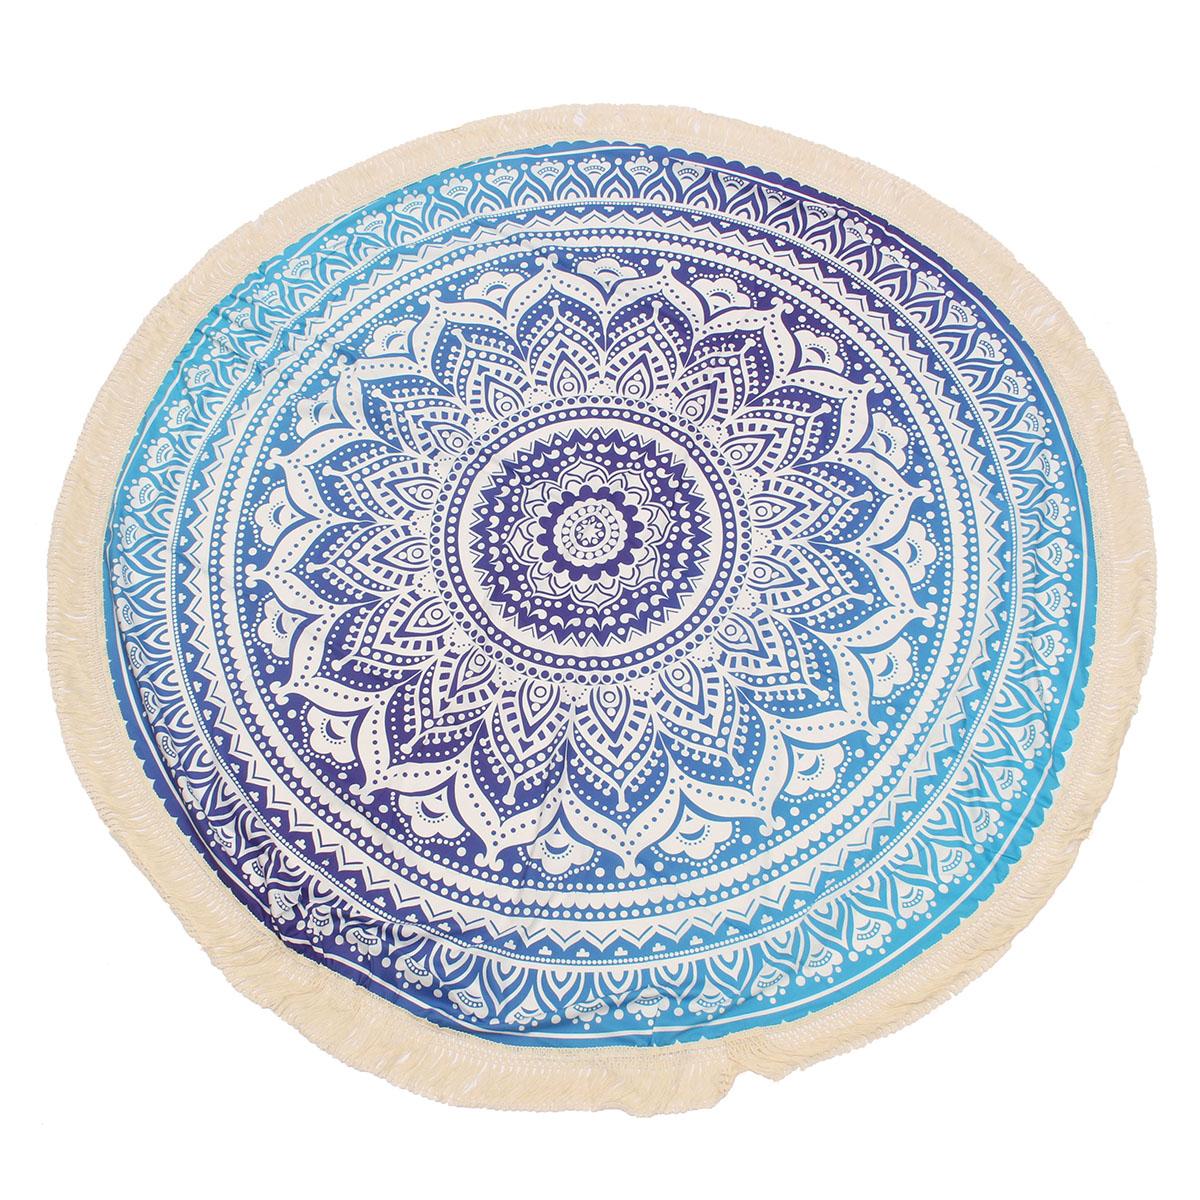 Buy 150CM Indian Round Mandala Tapestry Roundie Throw Blanket Hippie Beach Towel Yoga Mat